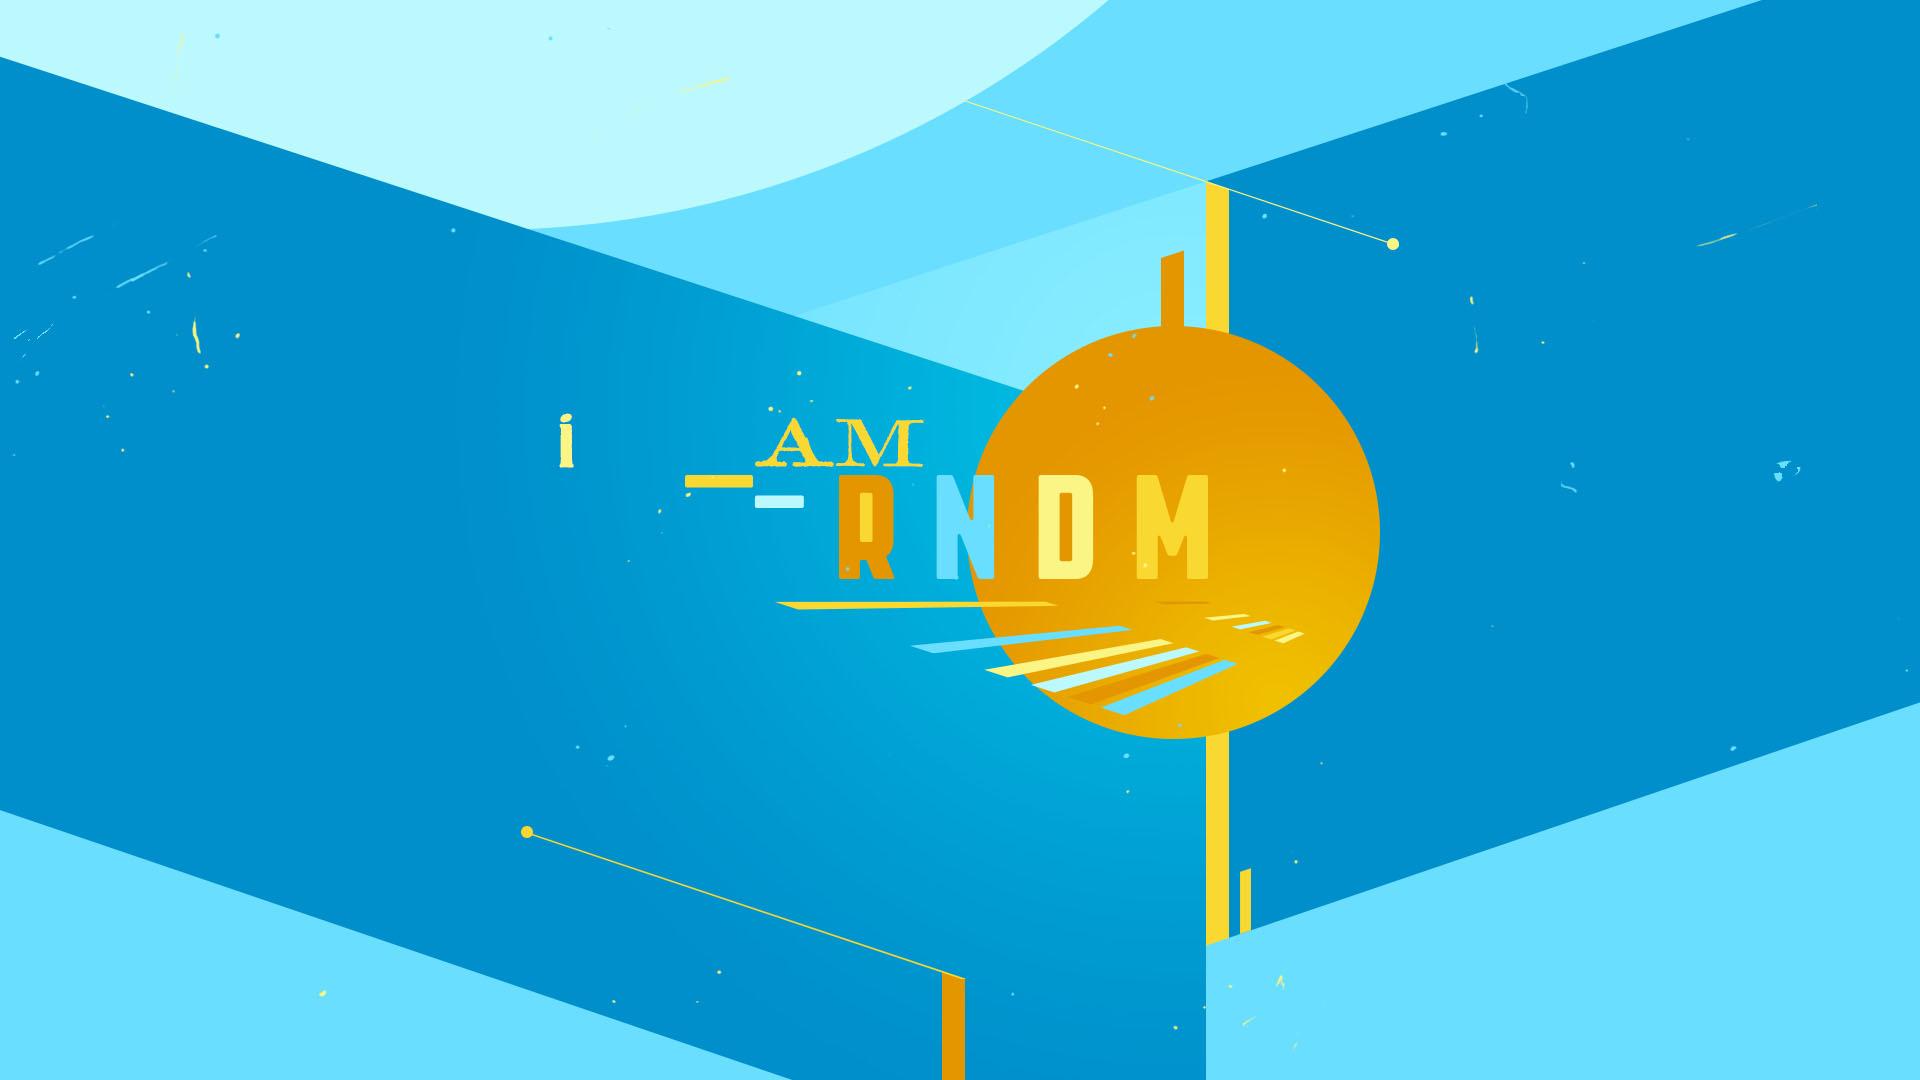 IAMRNDM_DesignFrame_02